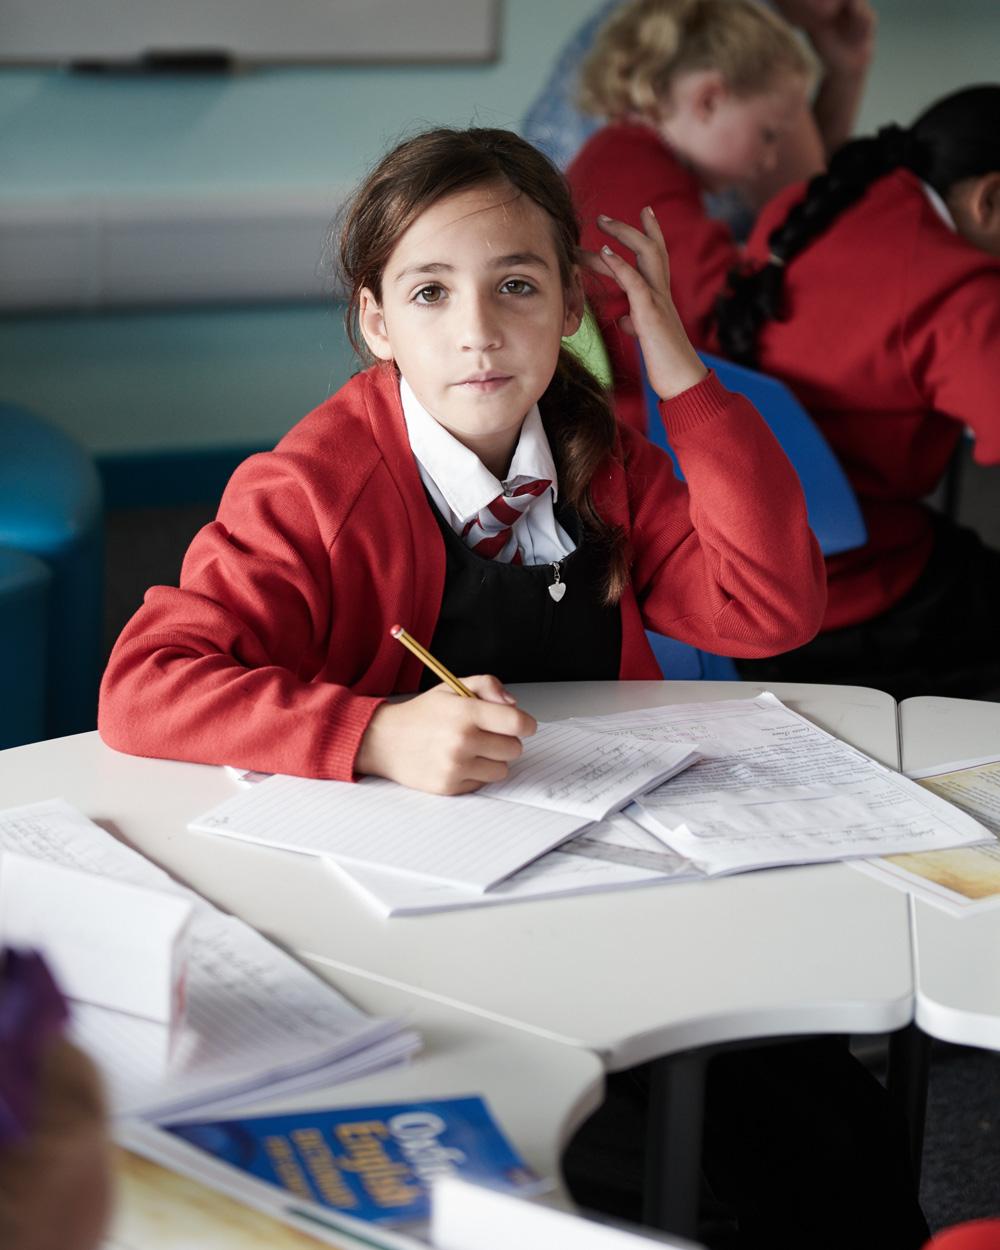 School_0130.jpg